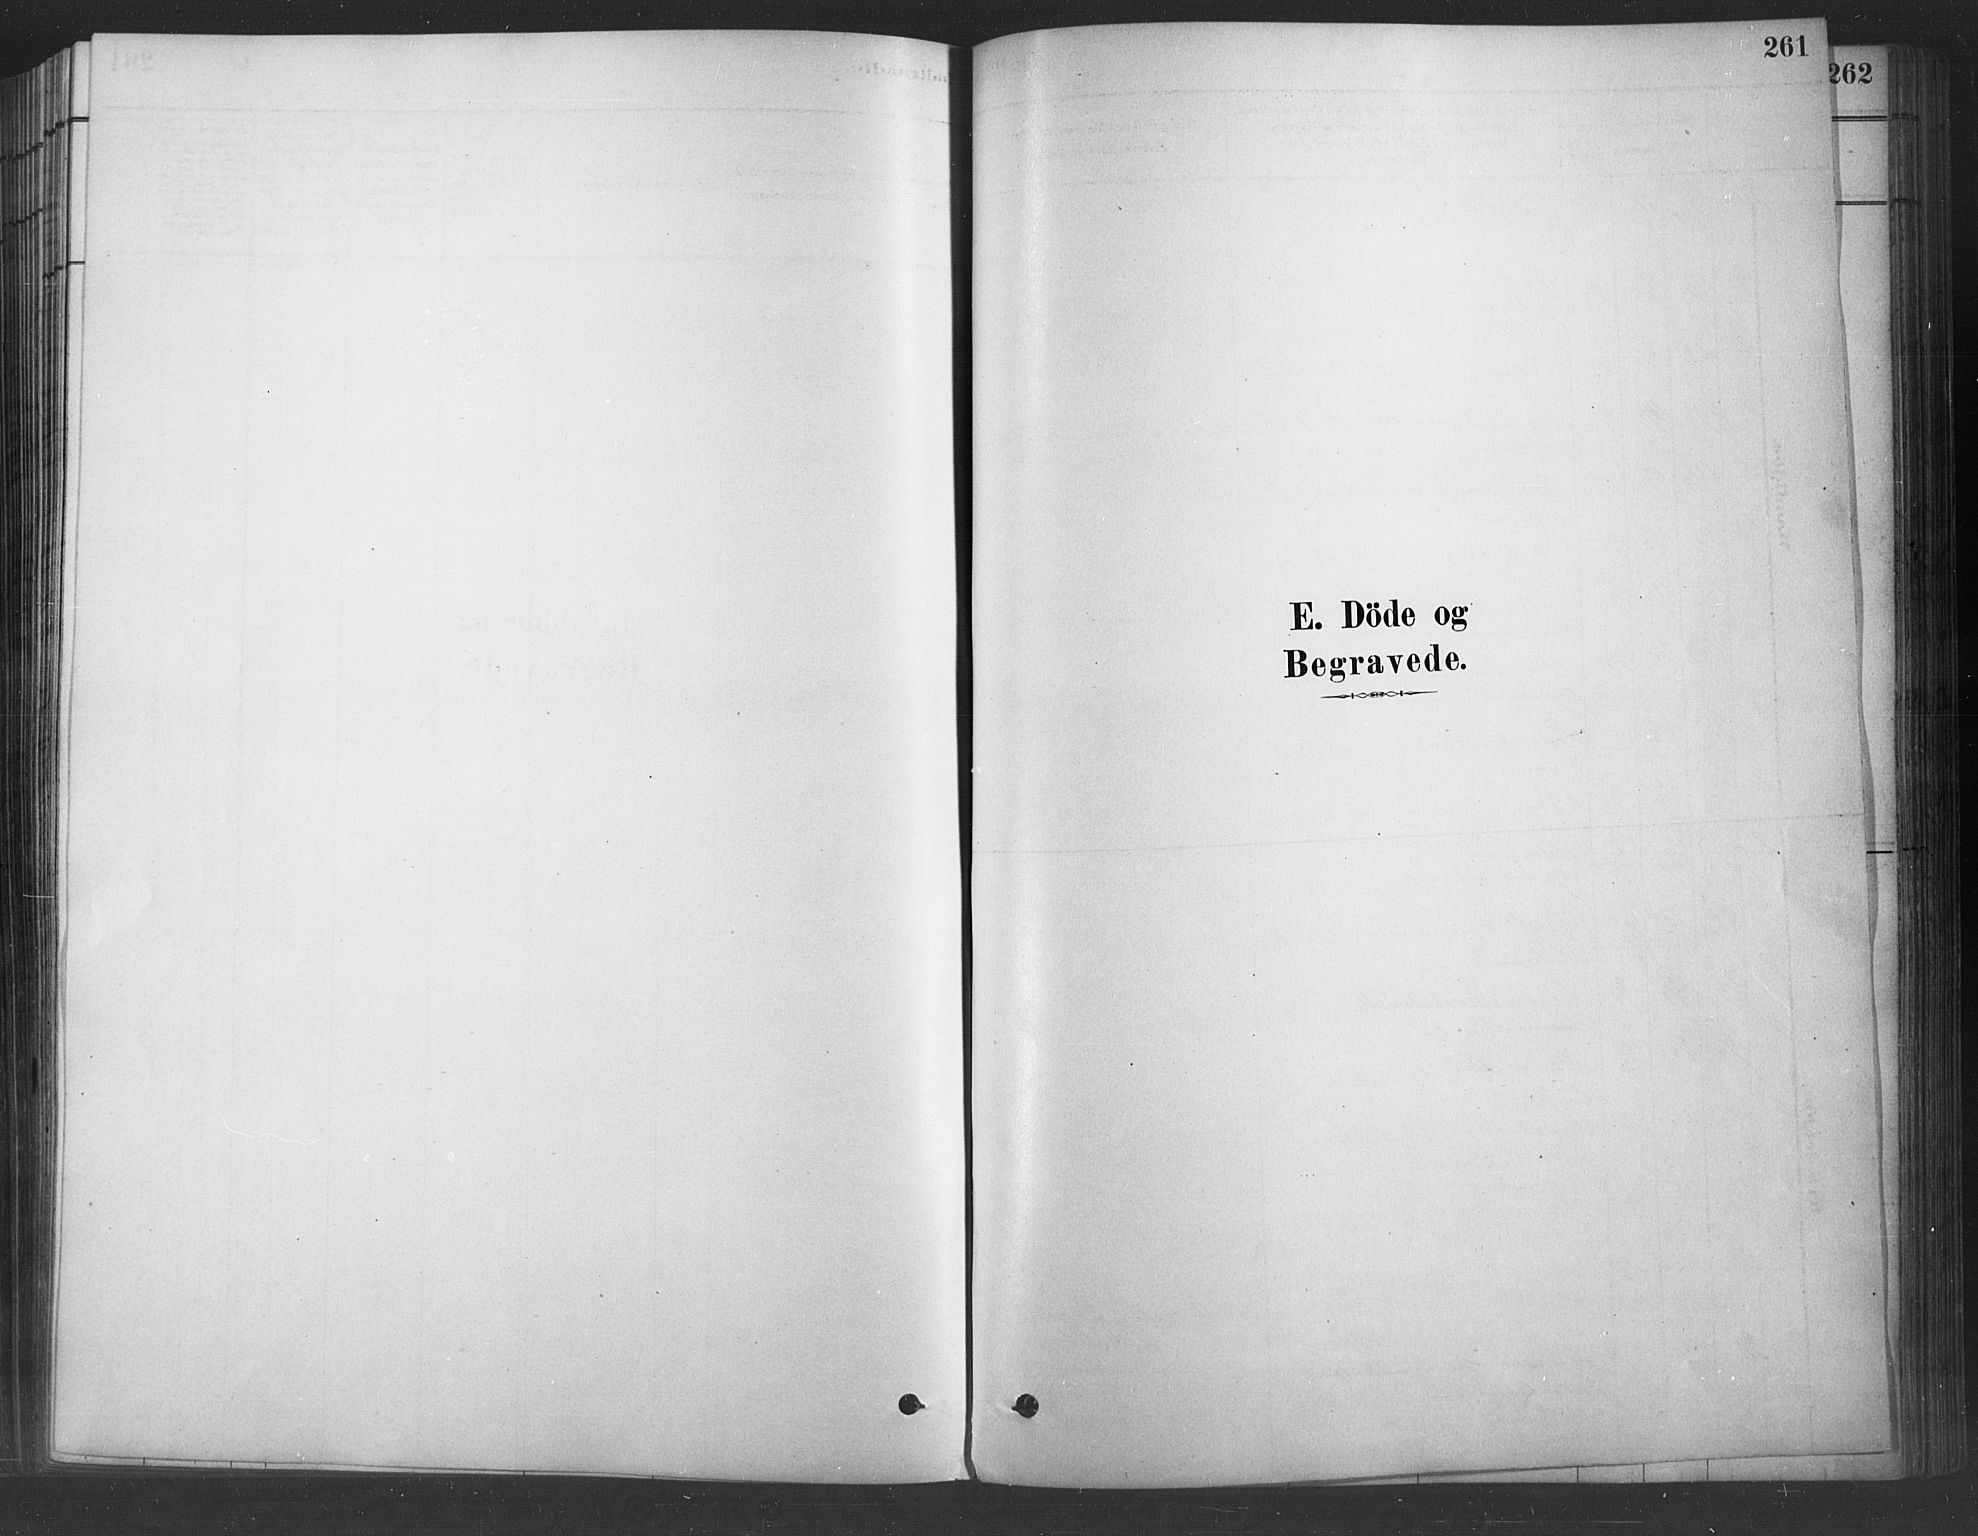 SAH, Fåberg prestekontor, H/Ha/Haa/L0009: Parish register (official) no. 9, 1879-1898, p. 261